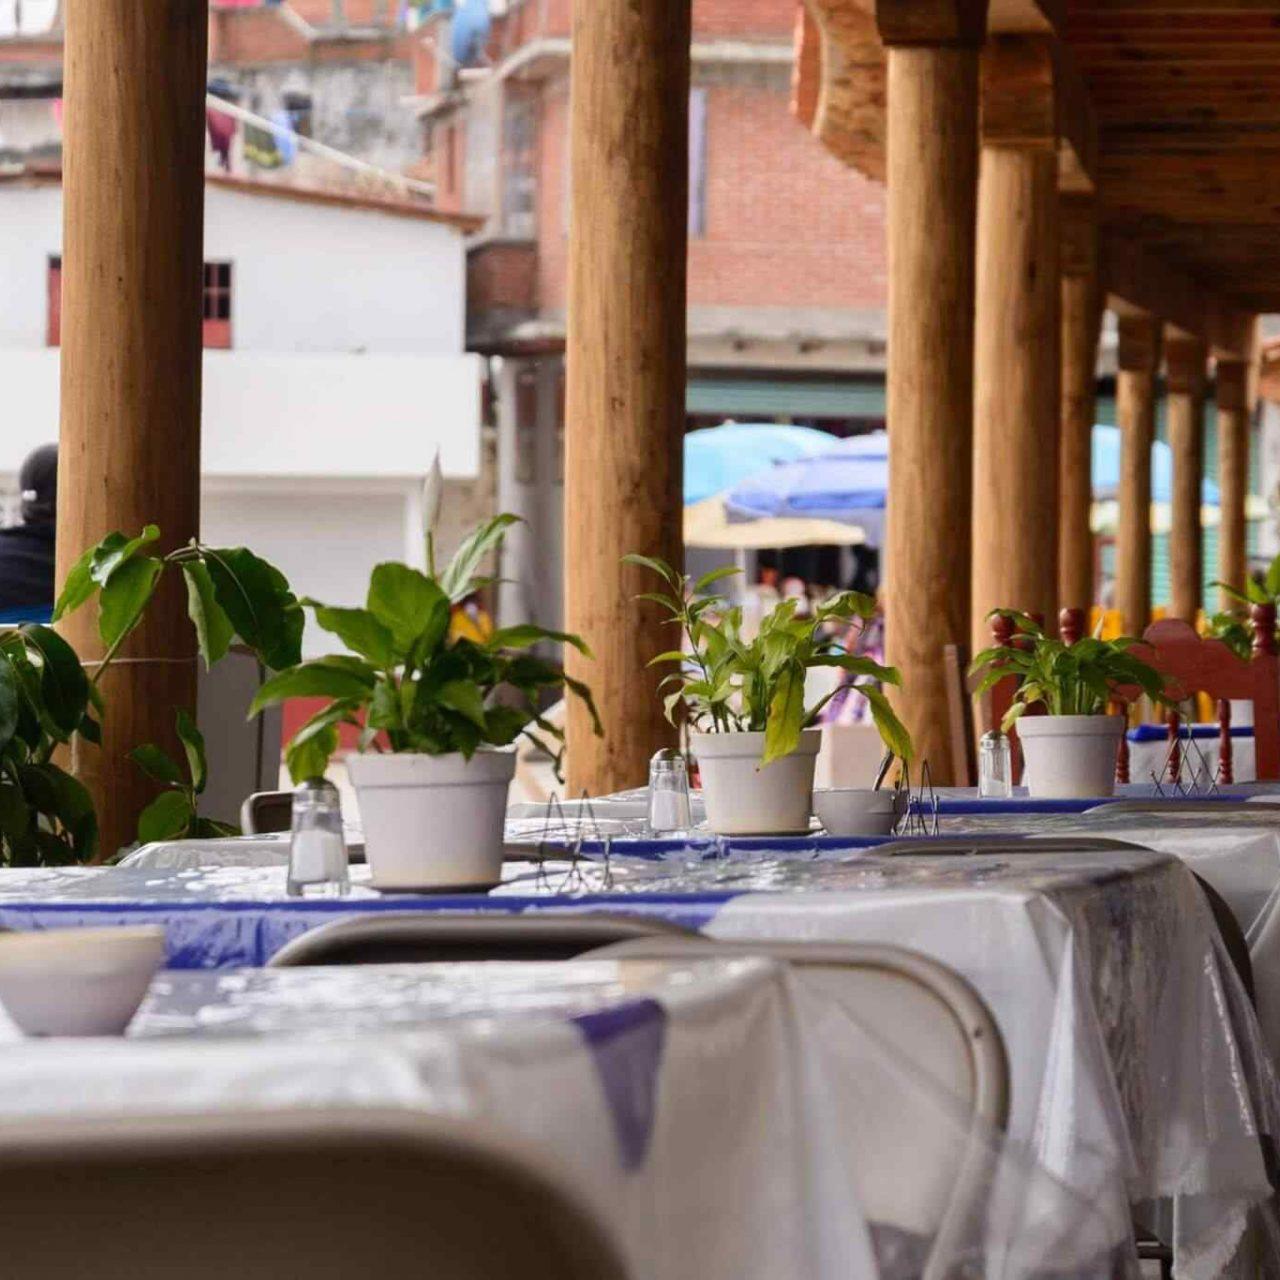 https://www.padondevoypr.com/wp-content/uploads/2017/10/restaurant-mexican-17-1280x1280.jpg